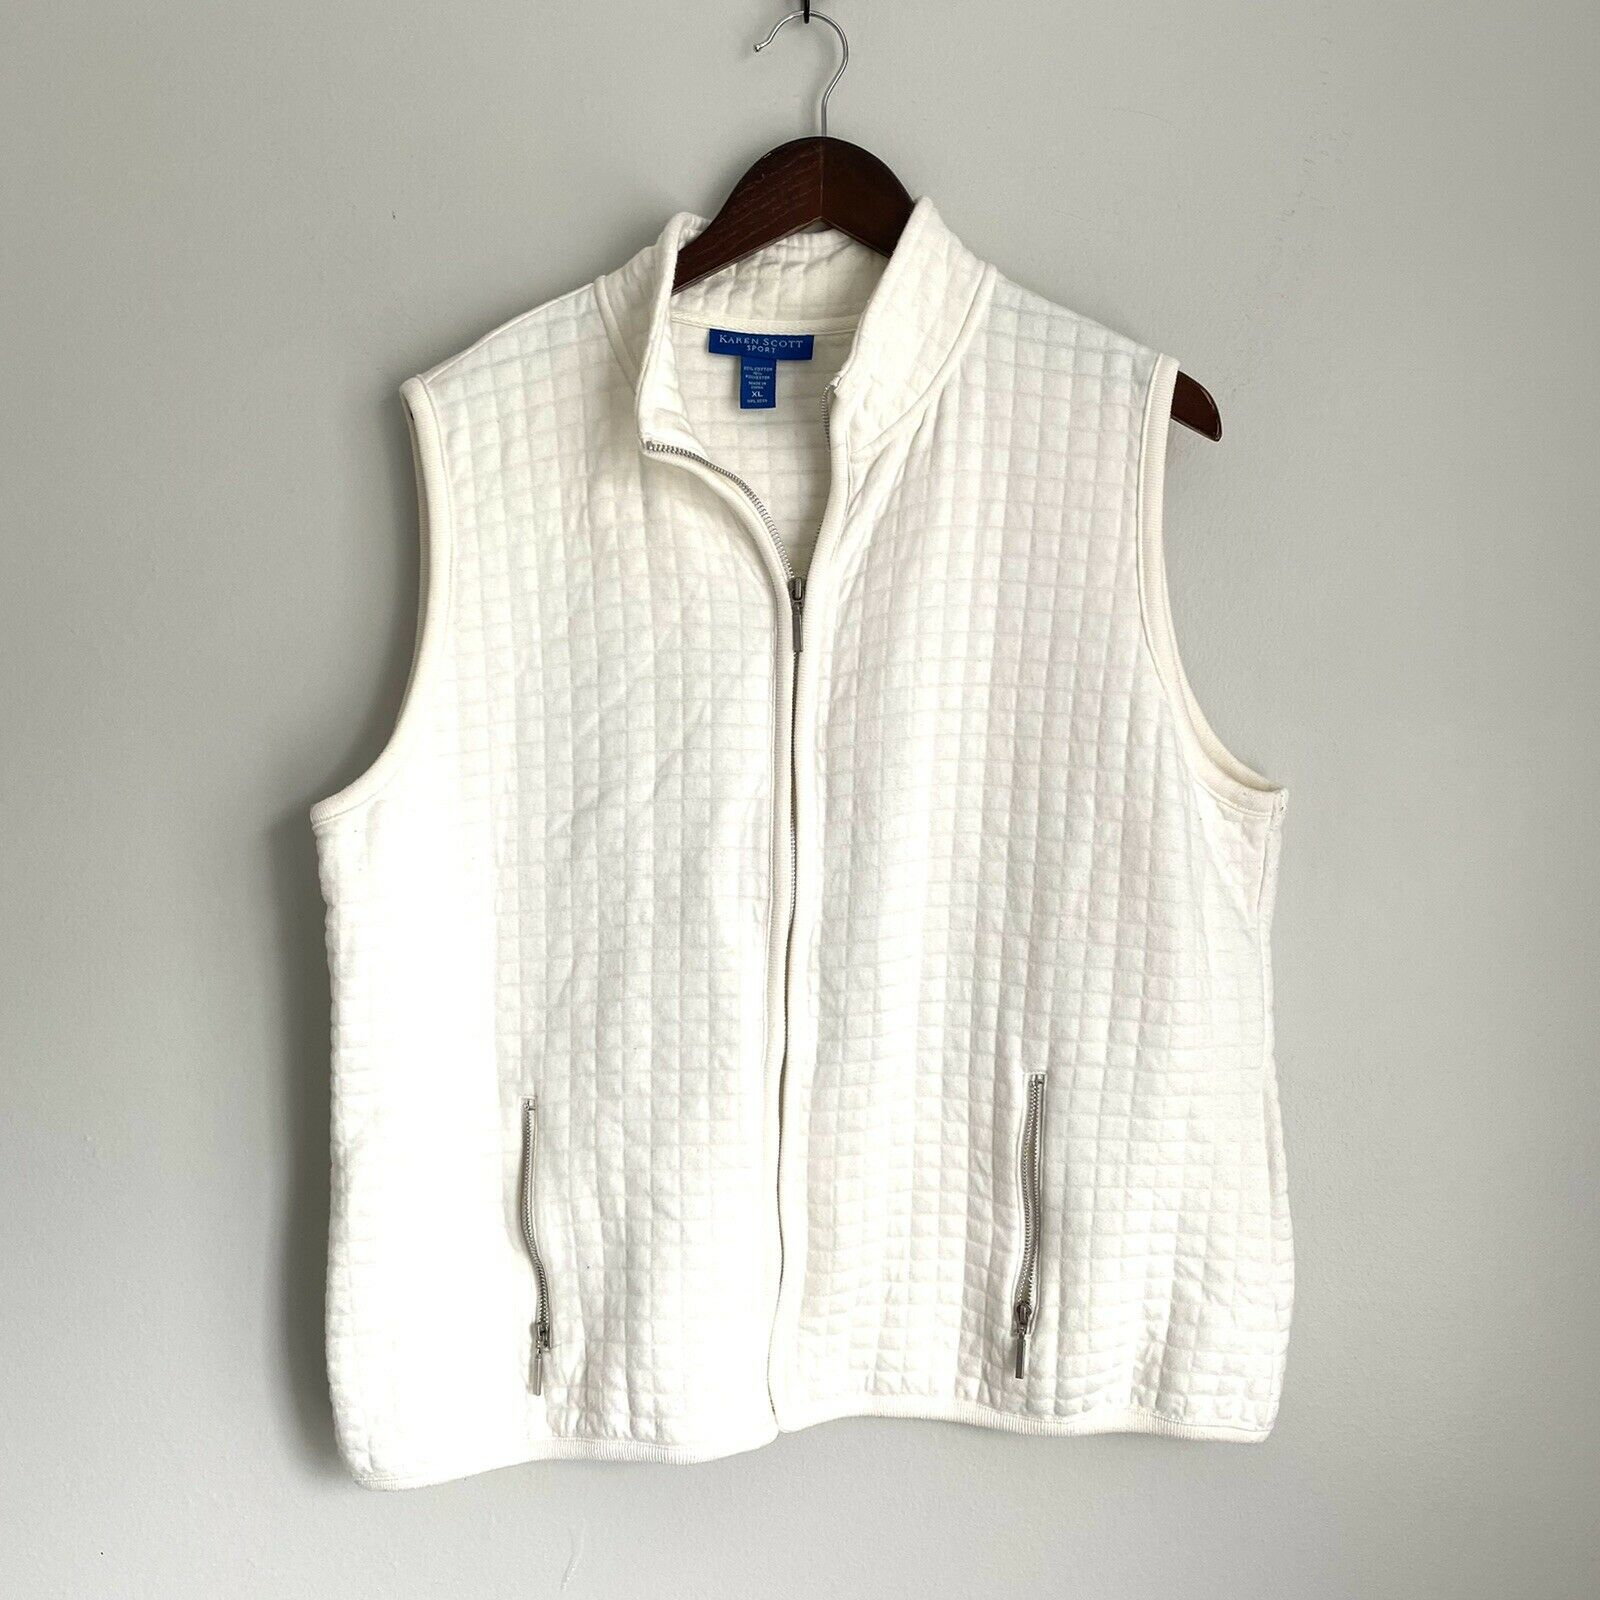 KAREN SCOTT Womens XL Ivory Cream Quilted Sleeveless Full Zip Vest DD6